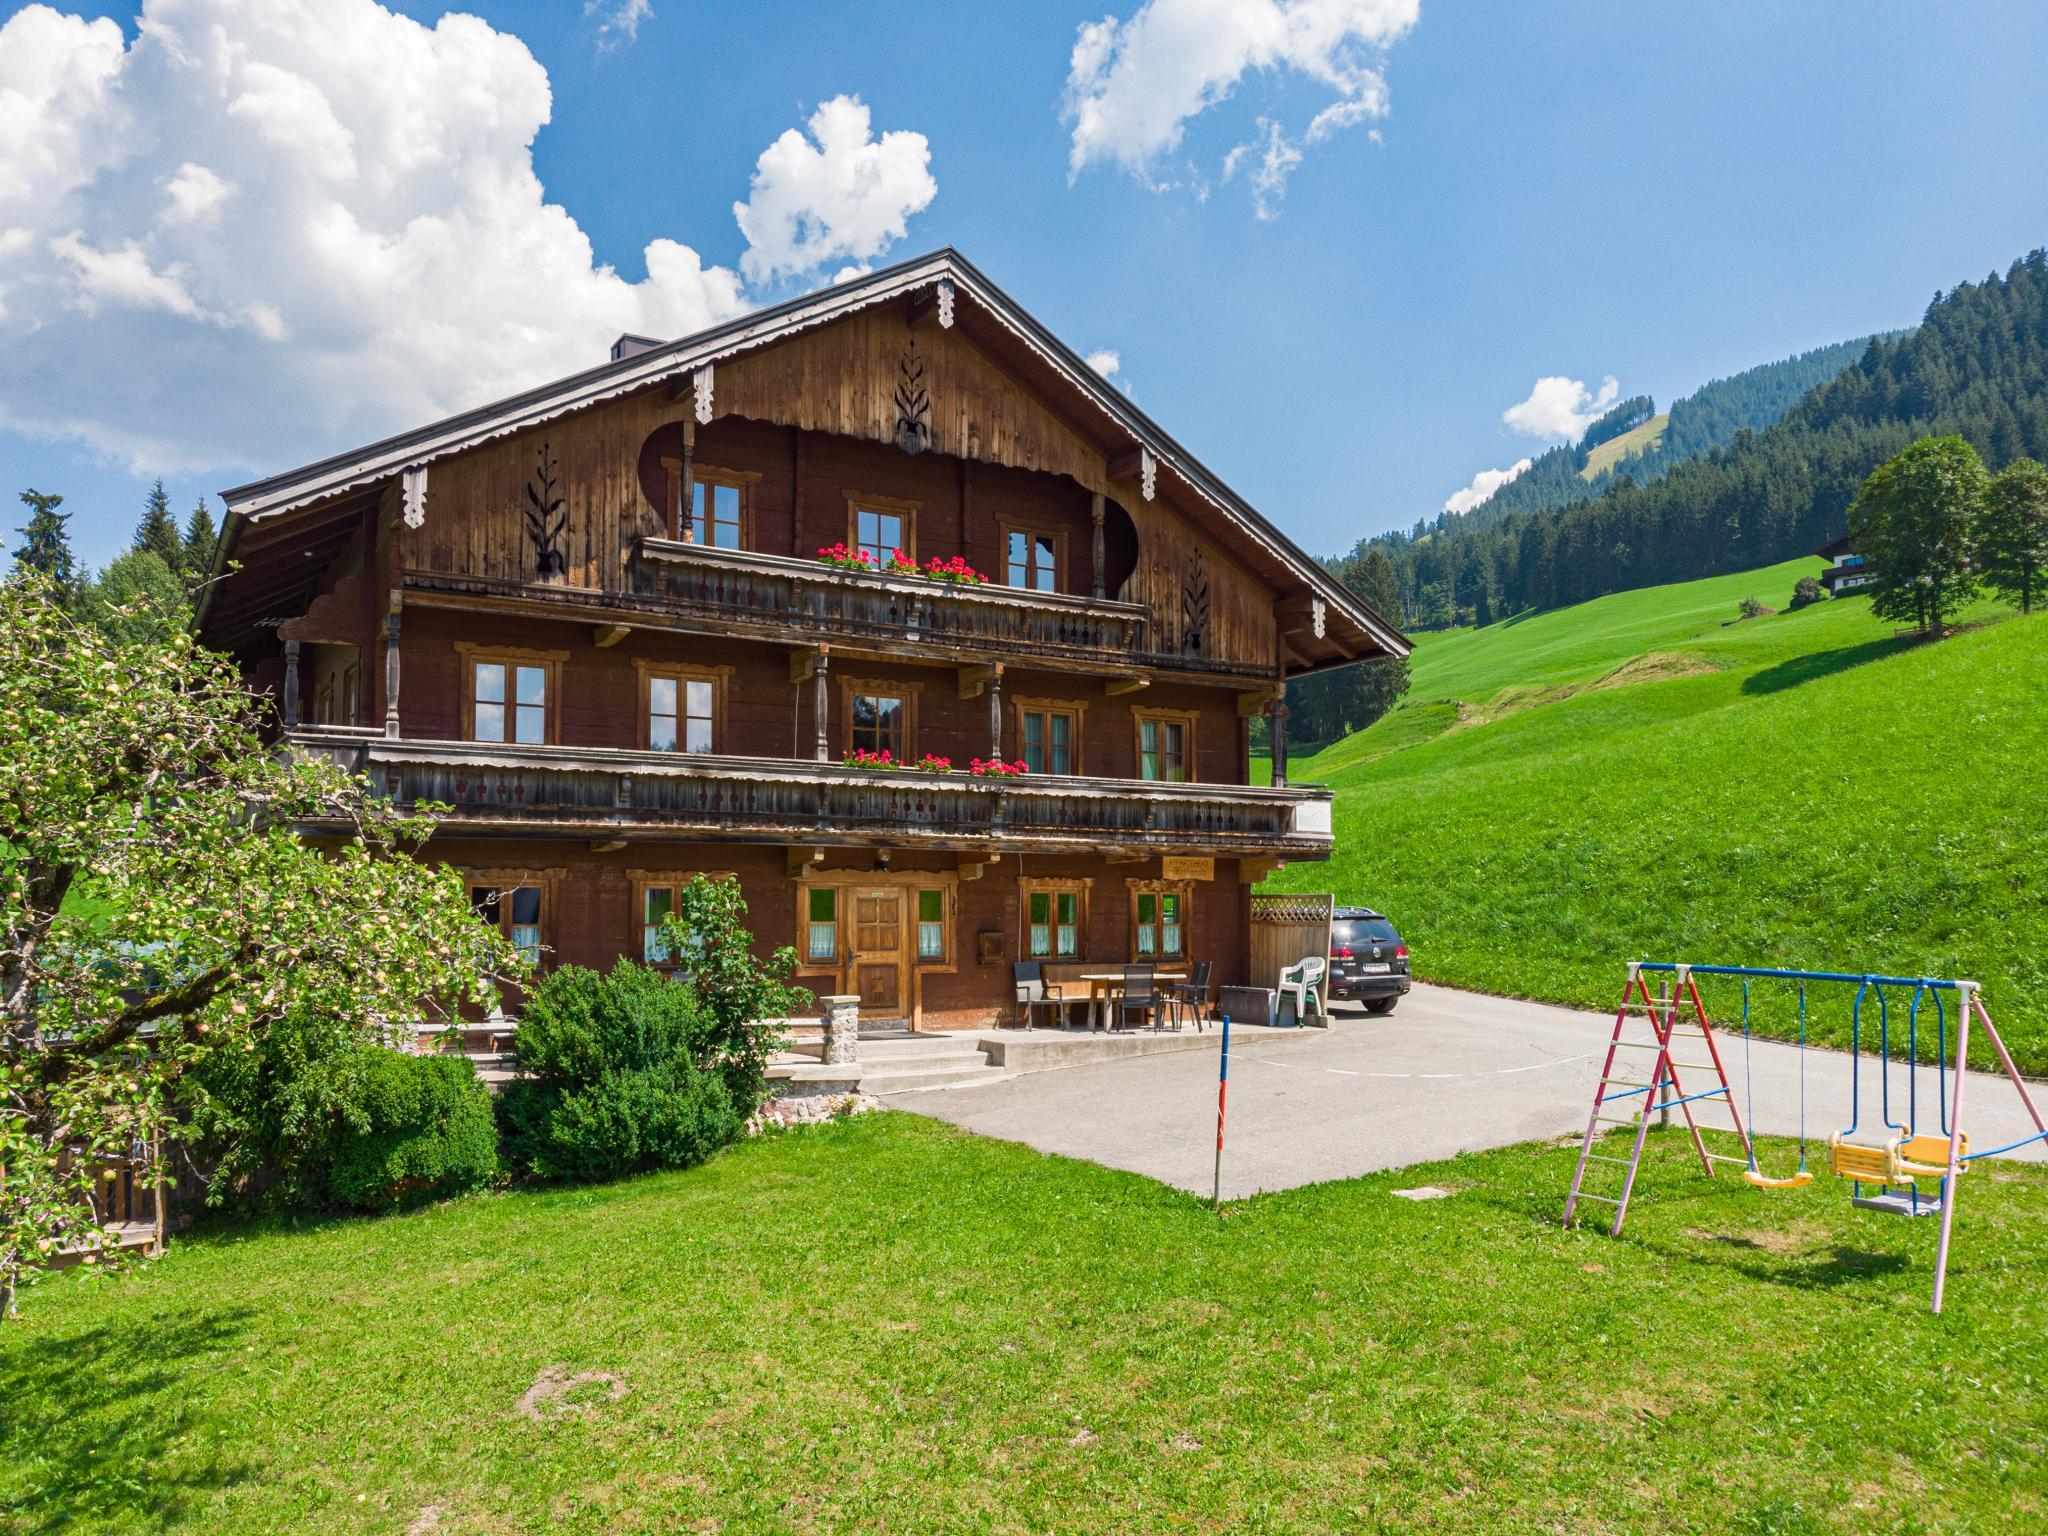 Feilgrub 2 Tirol